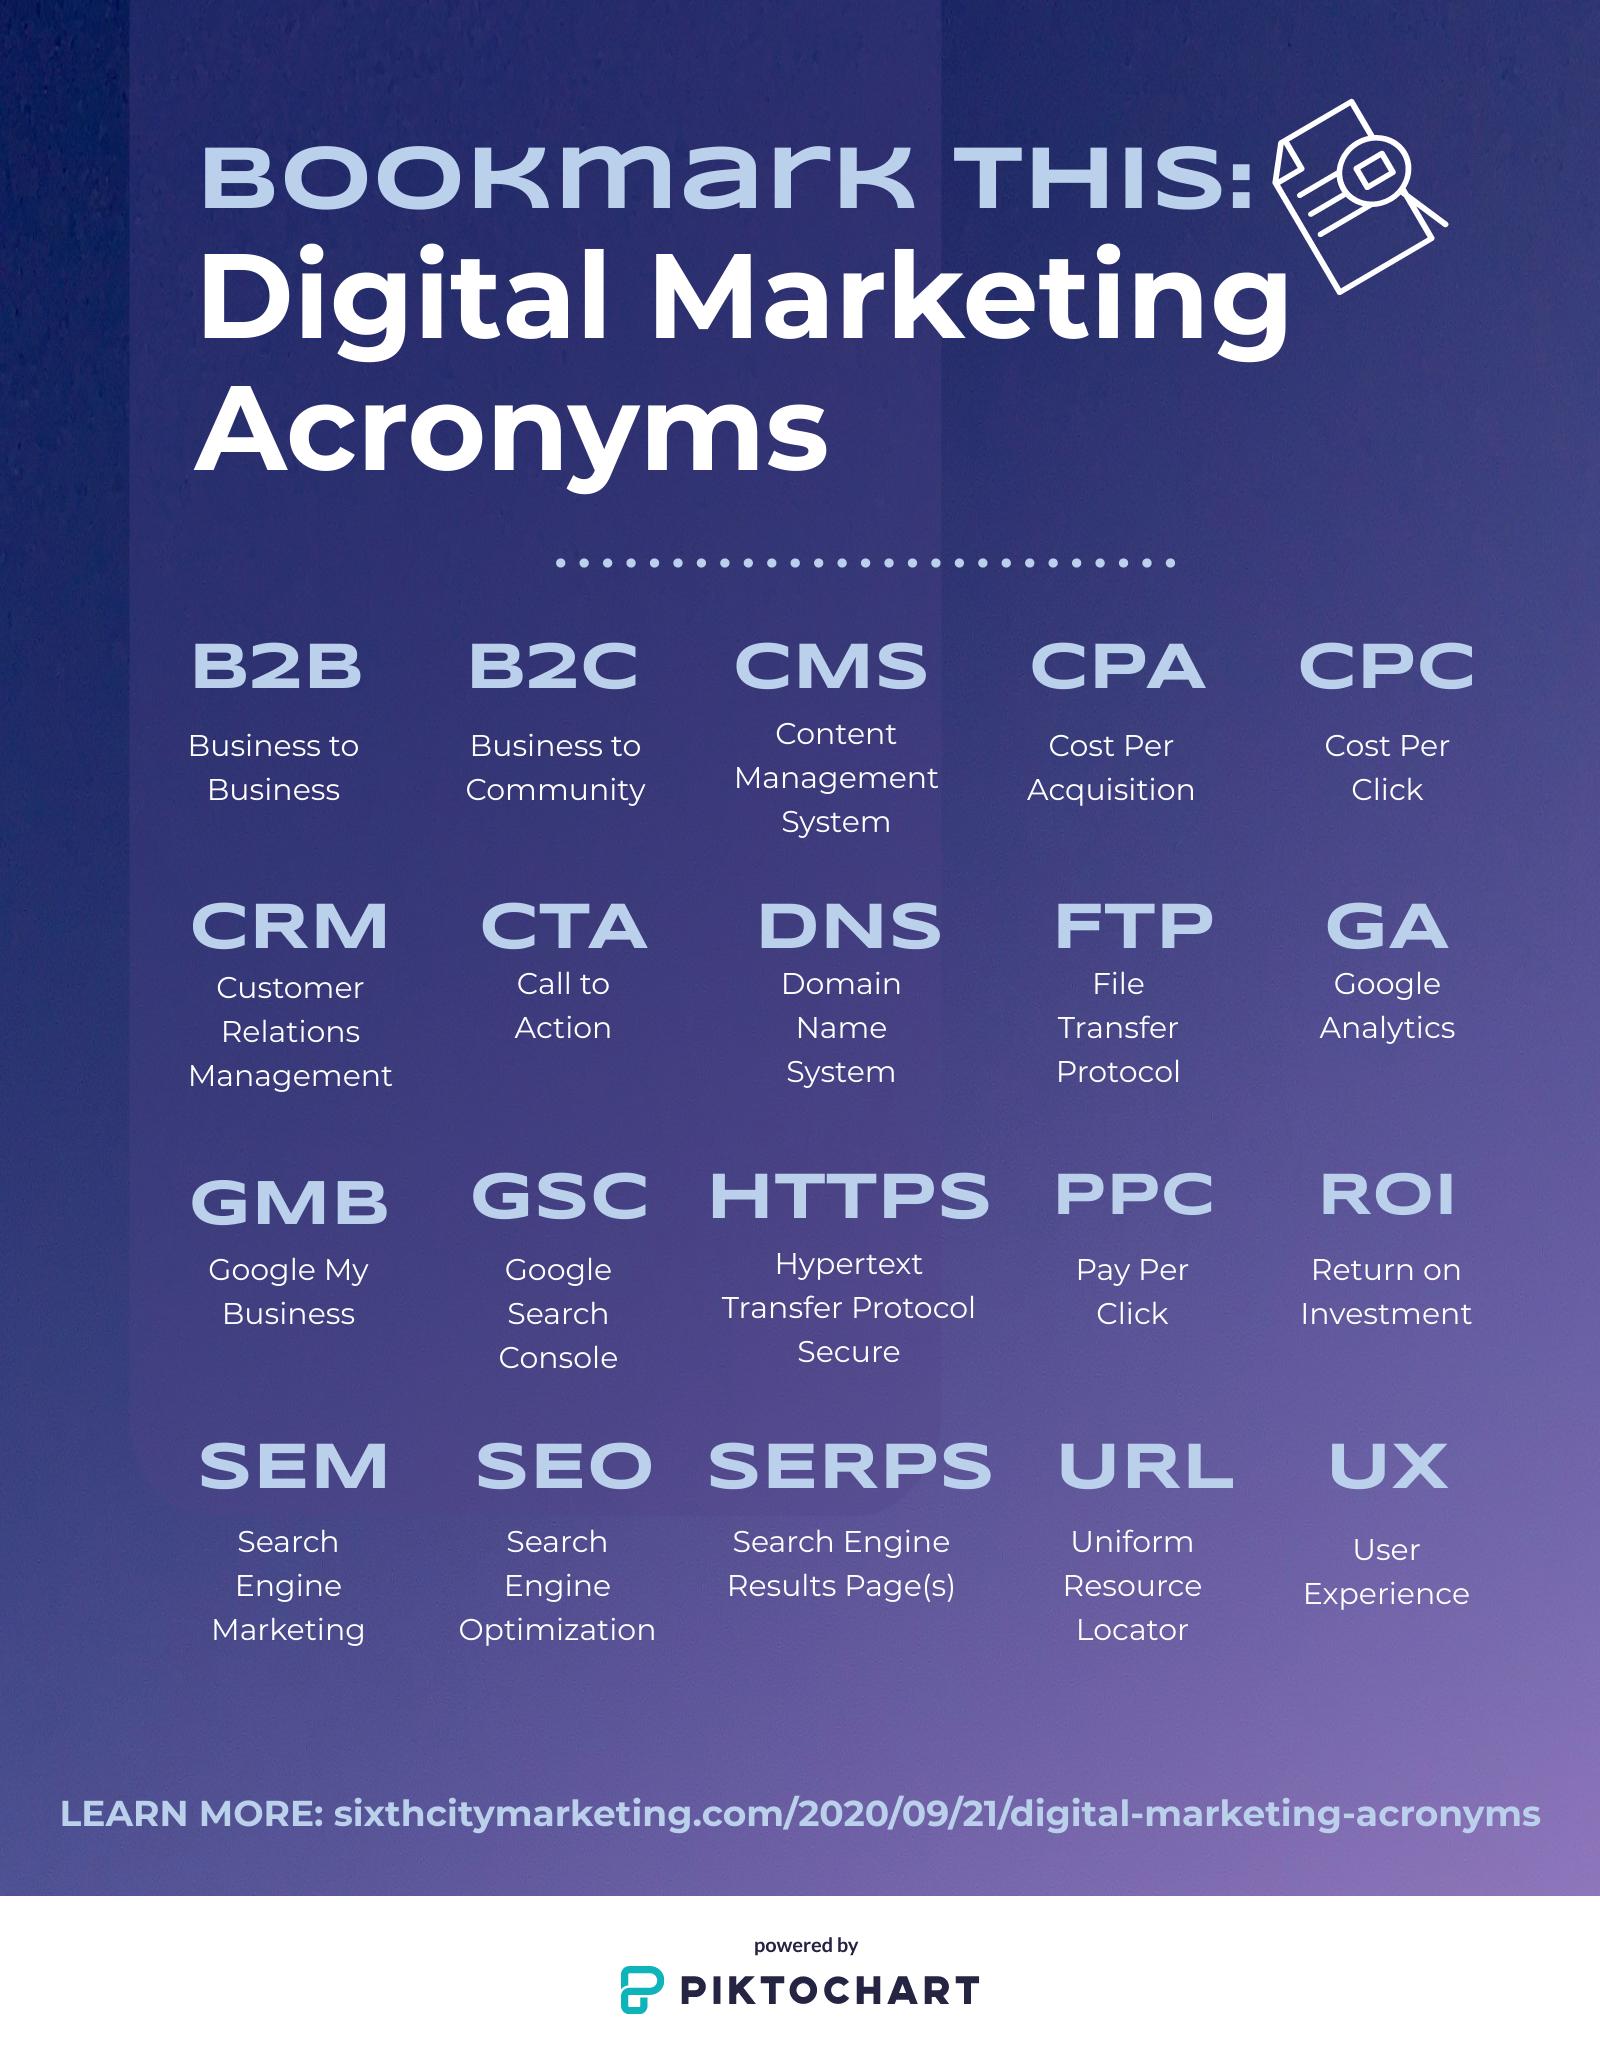 marketing acronyms infographic